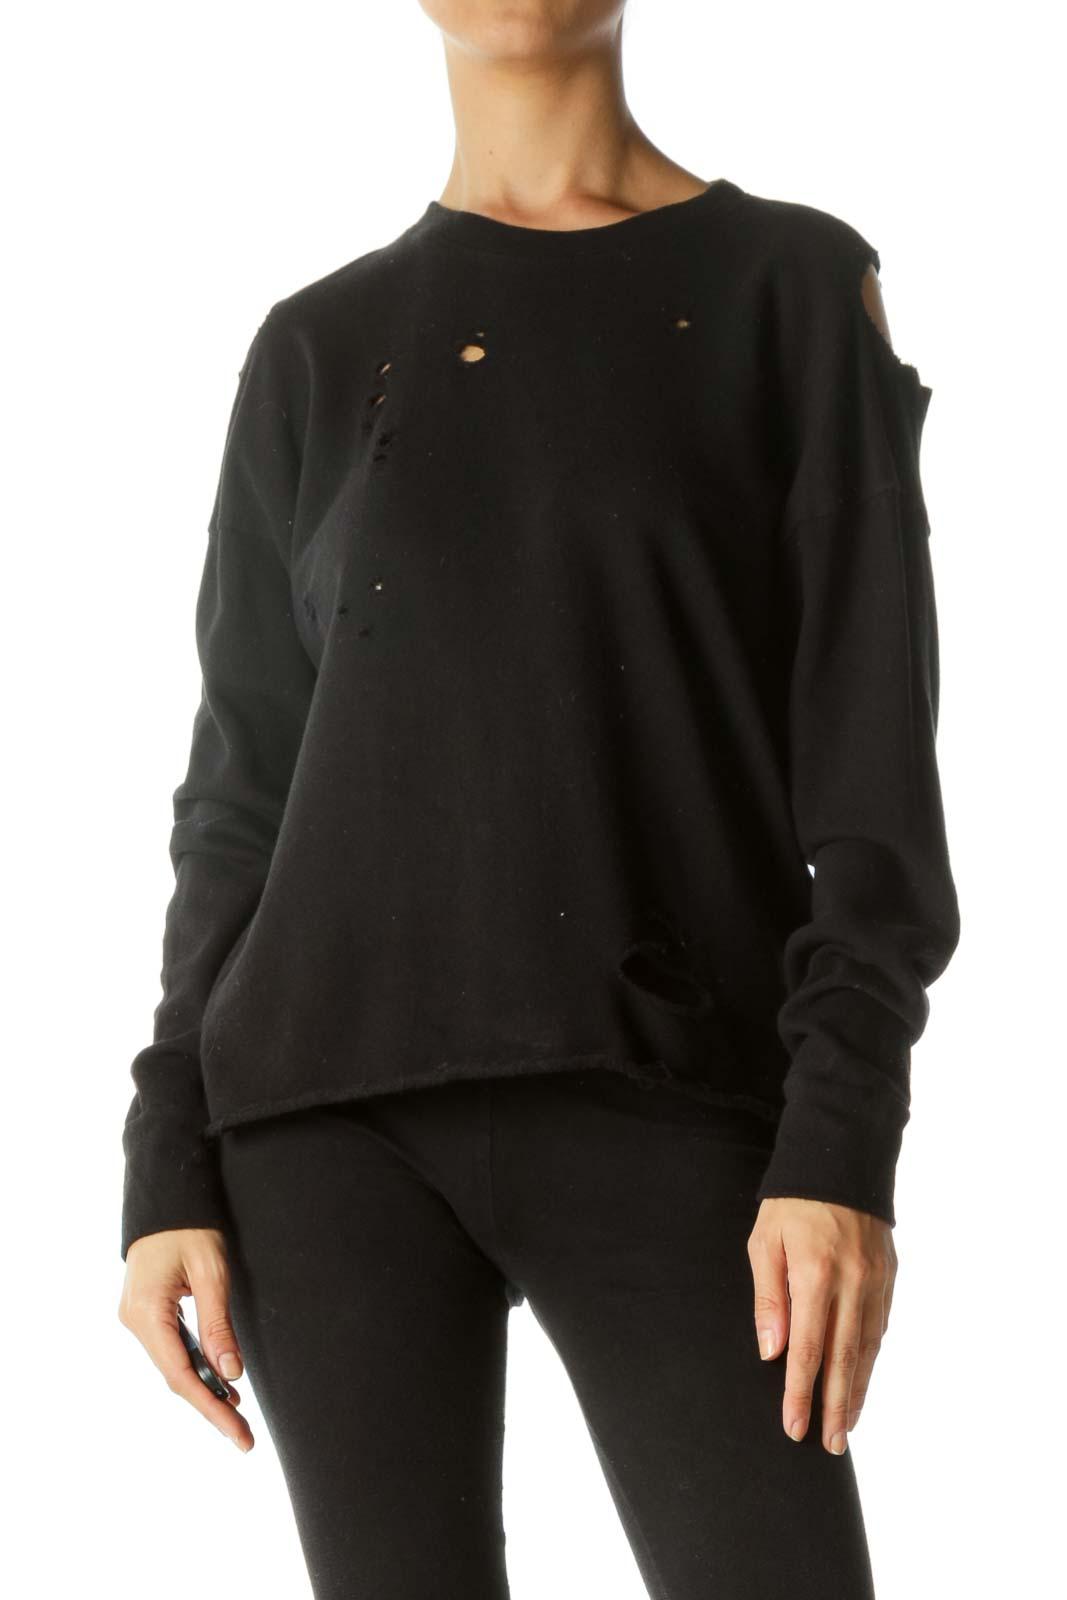 Black 100% Cotton Distressed Holes Cold-Shoulder Top Front